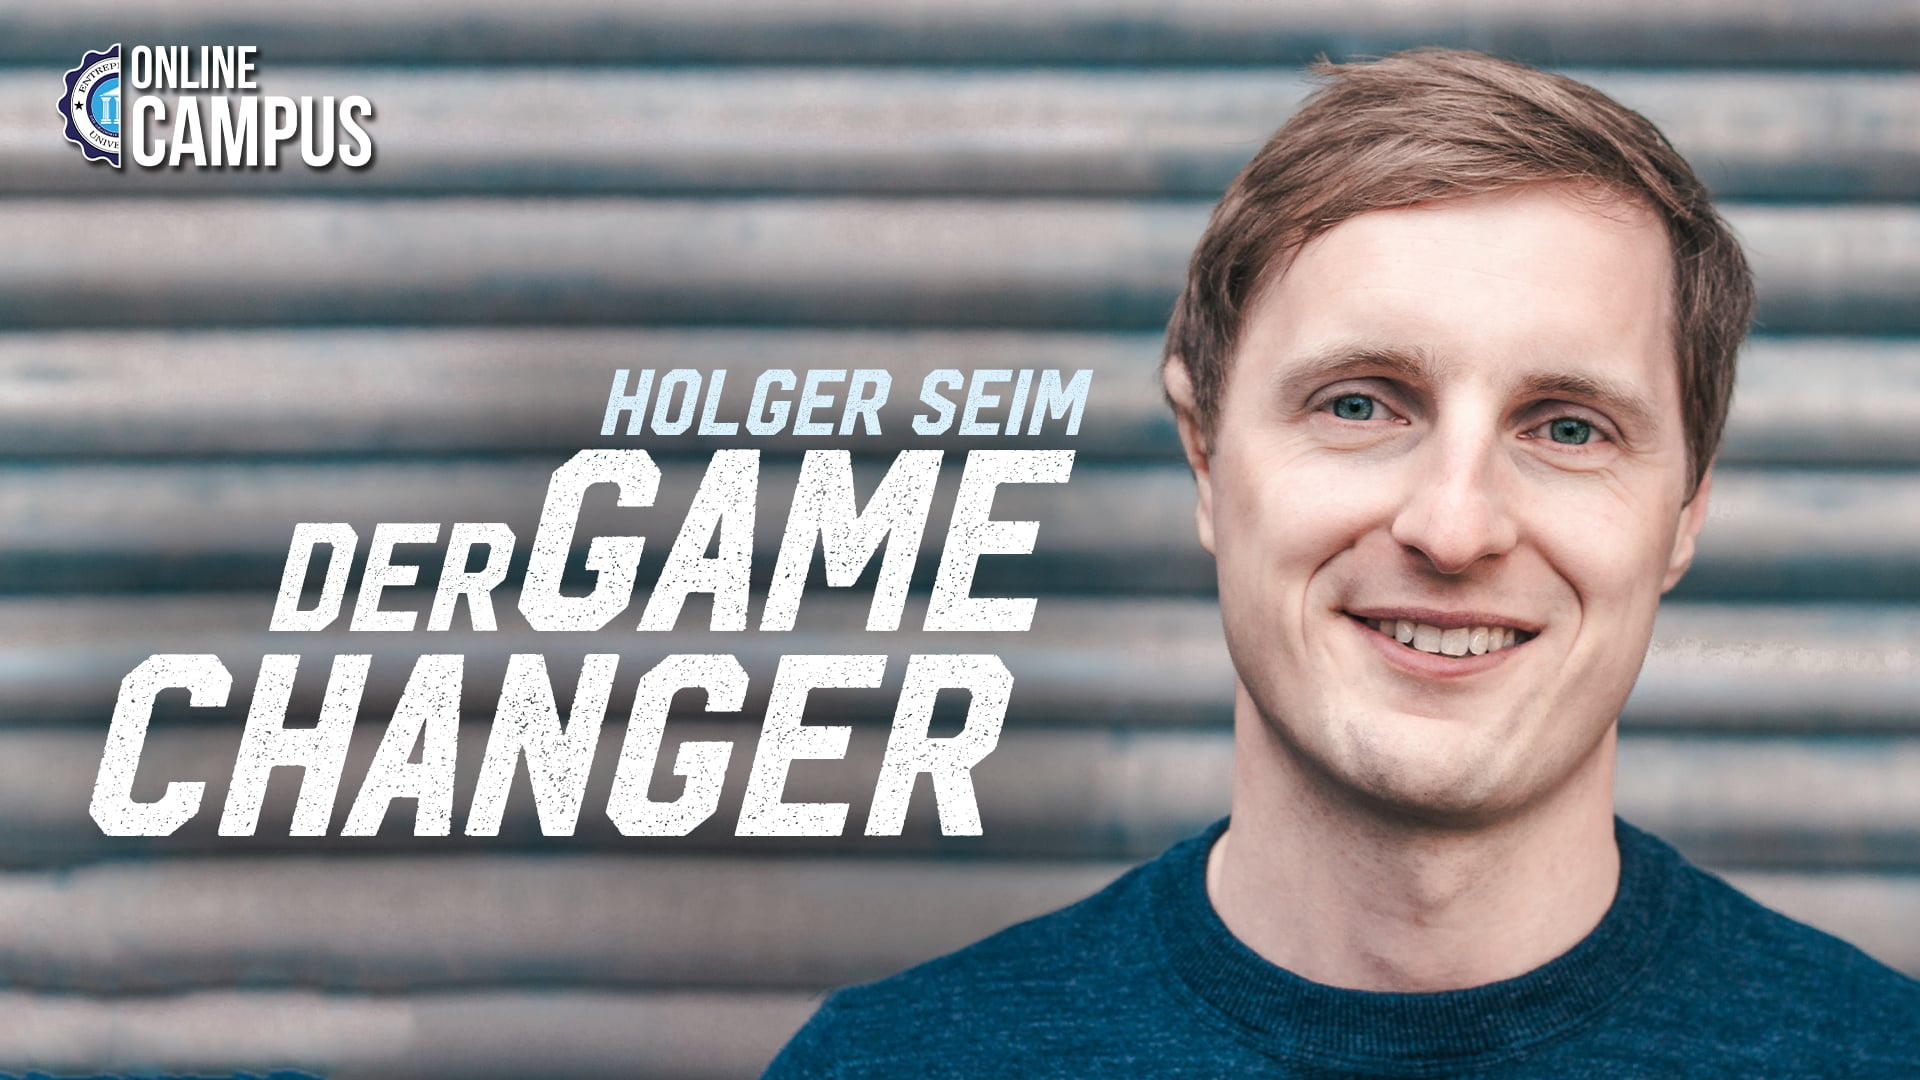 Holger Seim